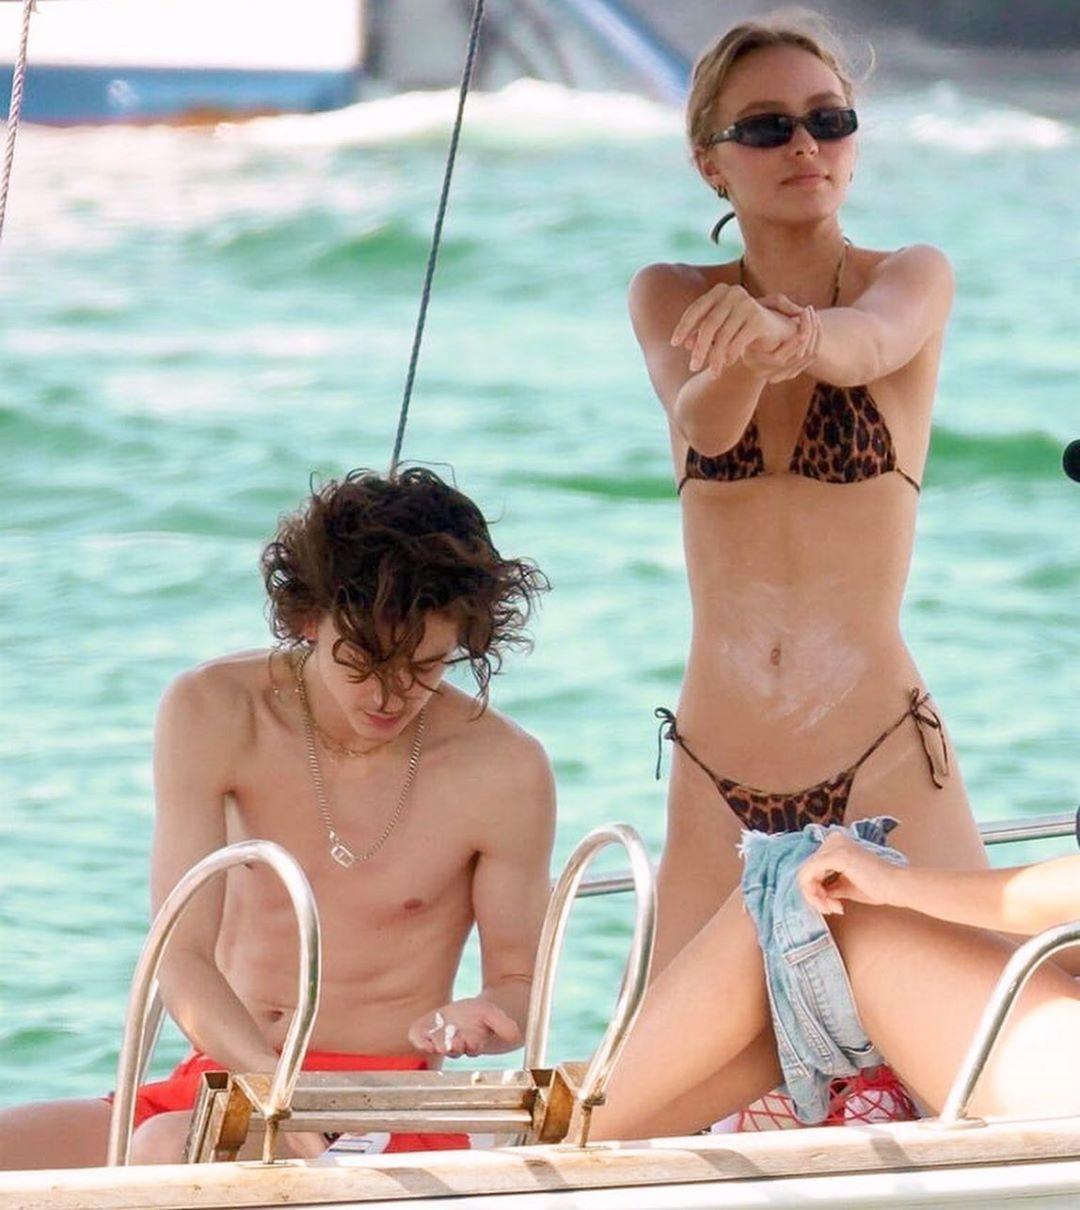 Timothee Chalamet E Lily Rose Depp Le Loro Foto Insieme A Capri Lily Rose Celebrity Bikini Lily Rose Depp